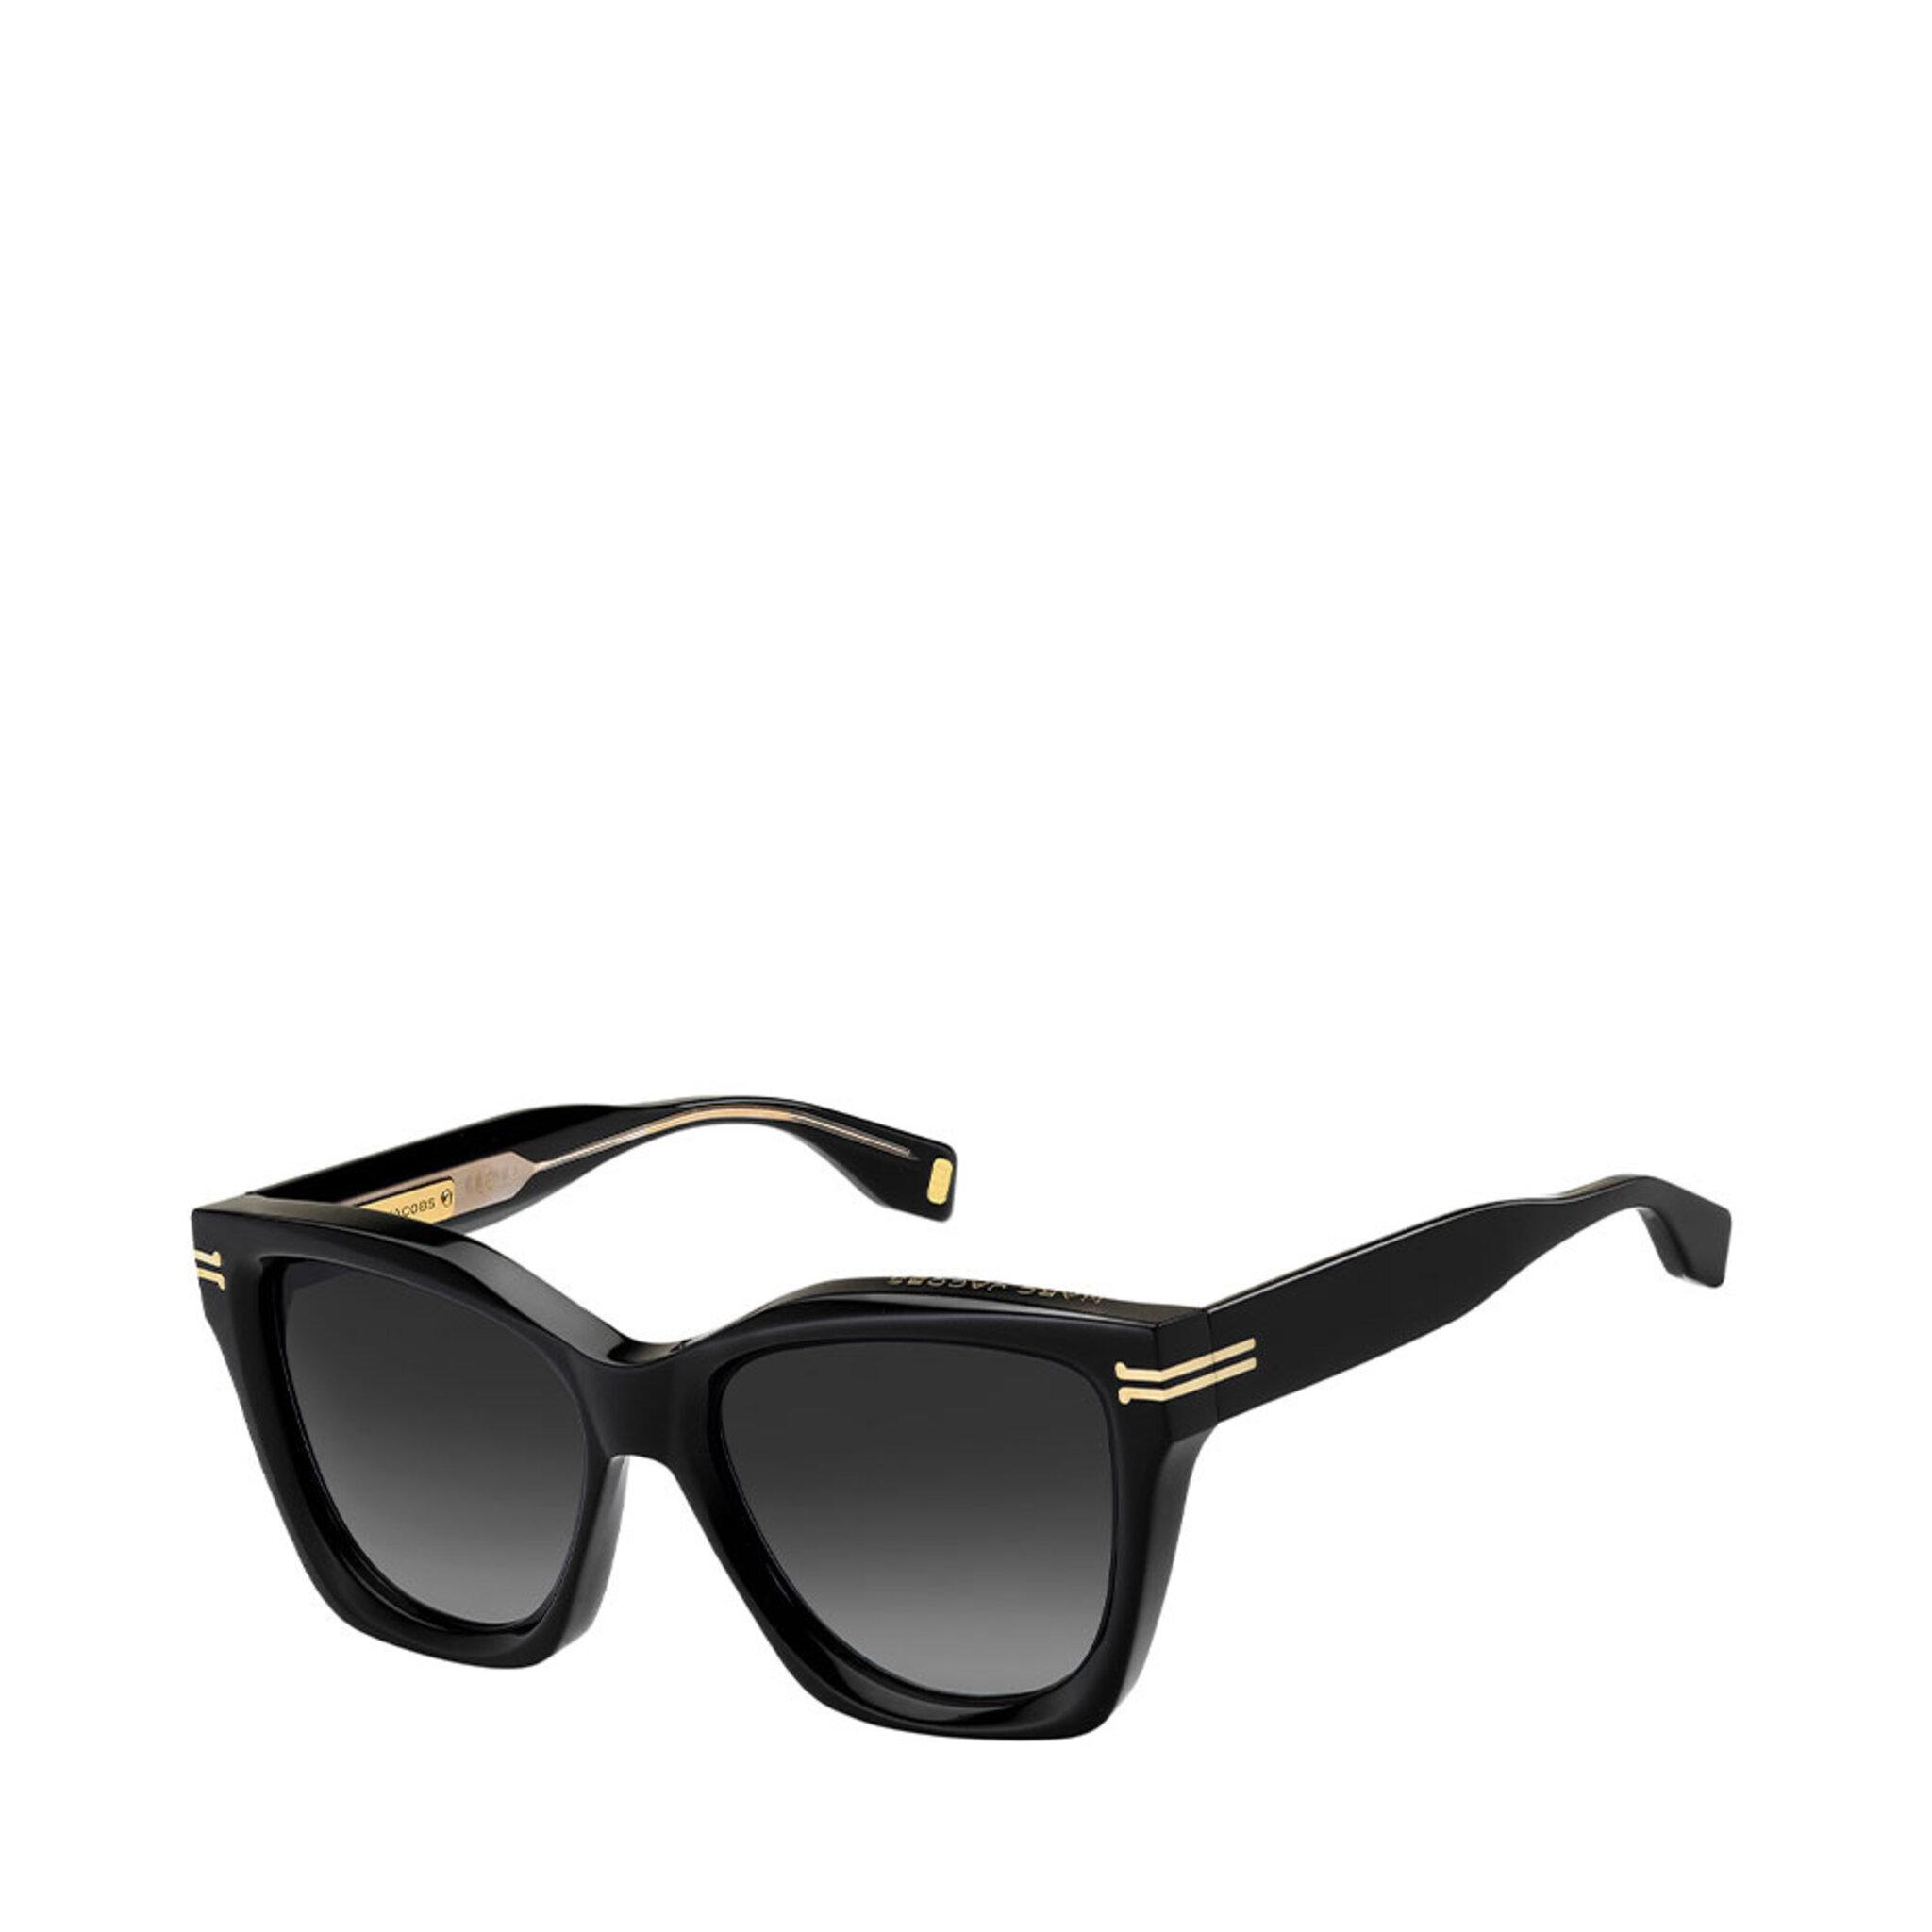 Sunglasses MJ 1000/S